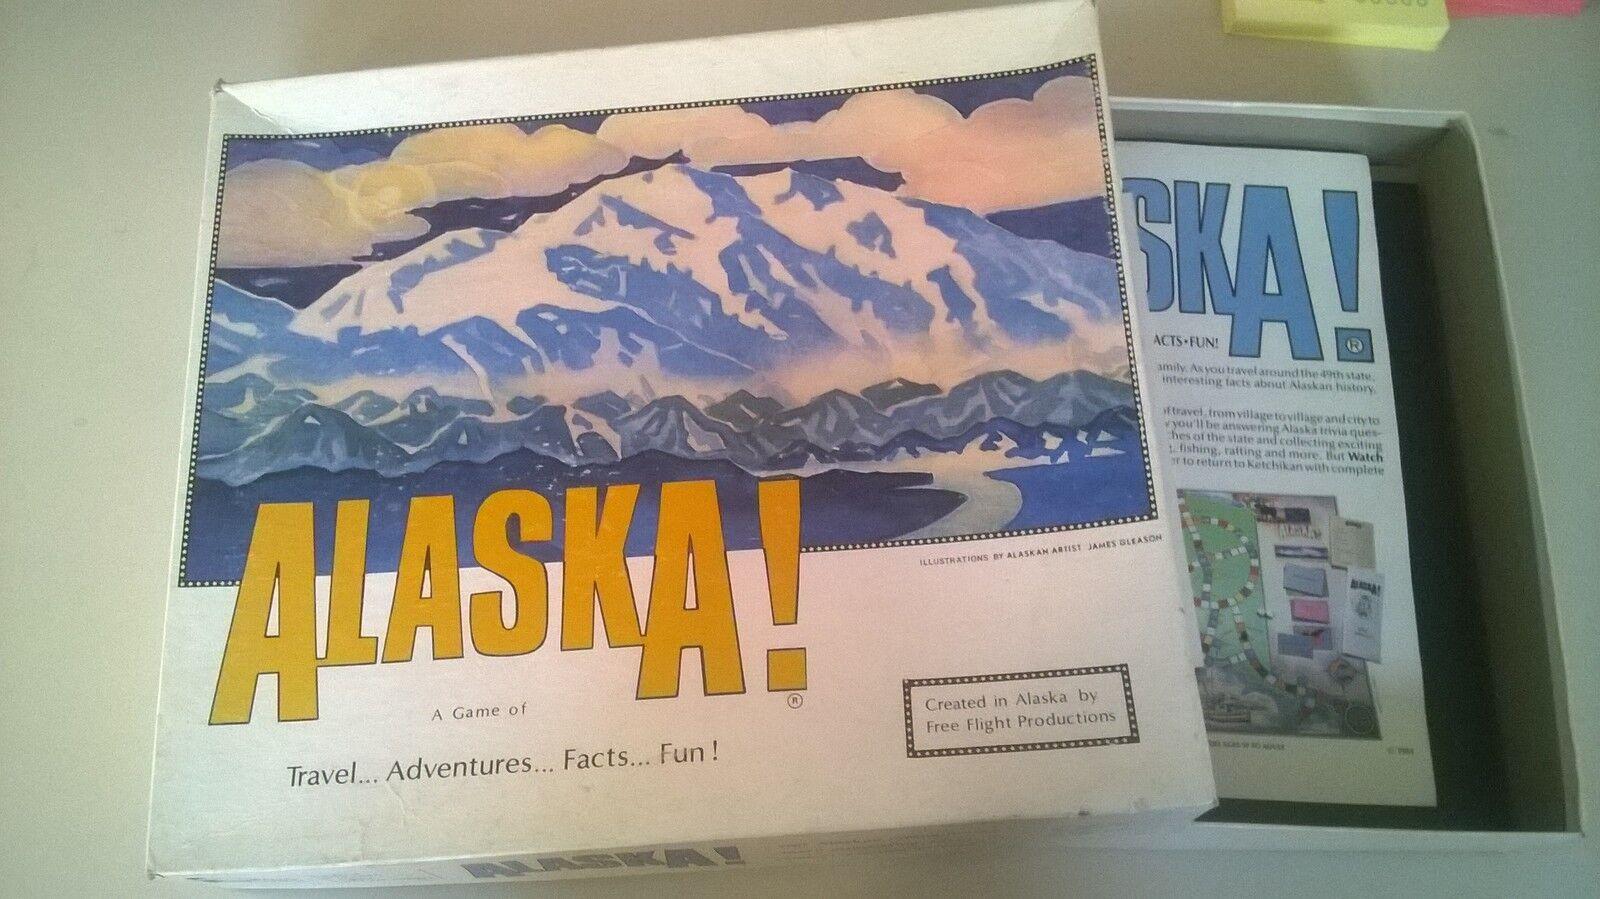 SPIEL Alaska Alaska Alaska   - Travel Adventure Facts Fun (10+  2-4 Sp.) FREE FLIGHT PROD '84 6fc2d6